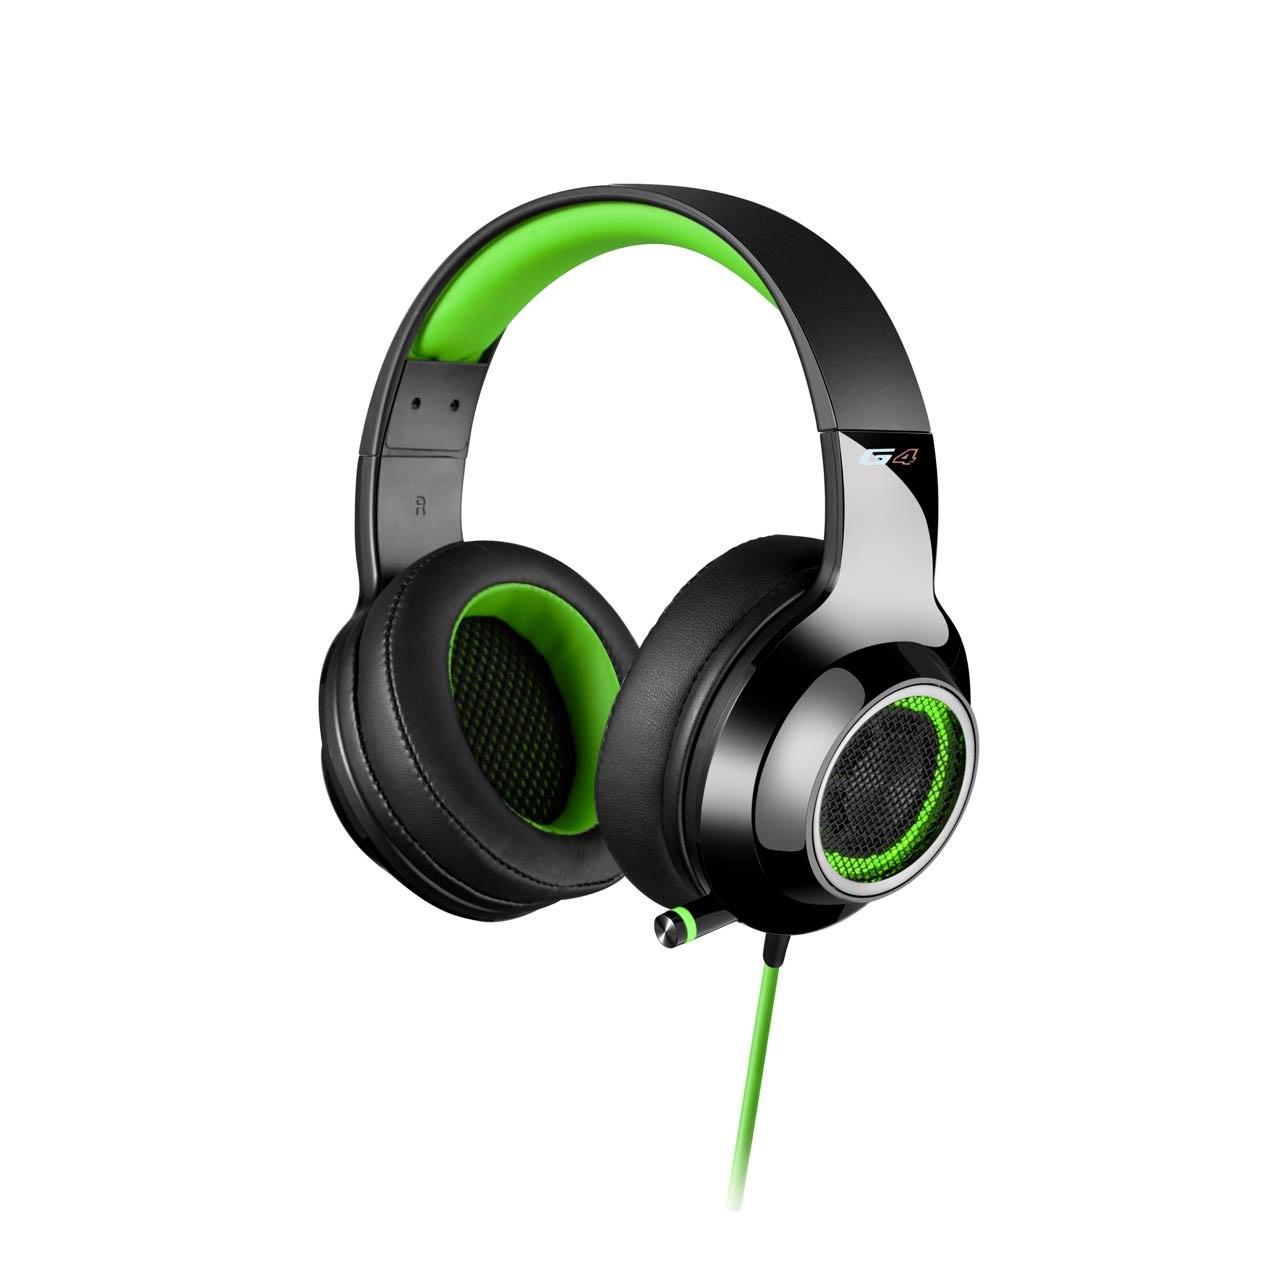 Edifier V4 (G4) 7.1 Virtual Surround Sound Usb Gaming Headset Green